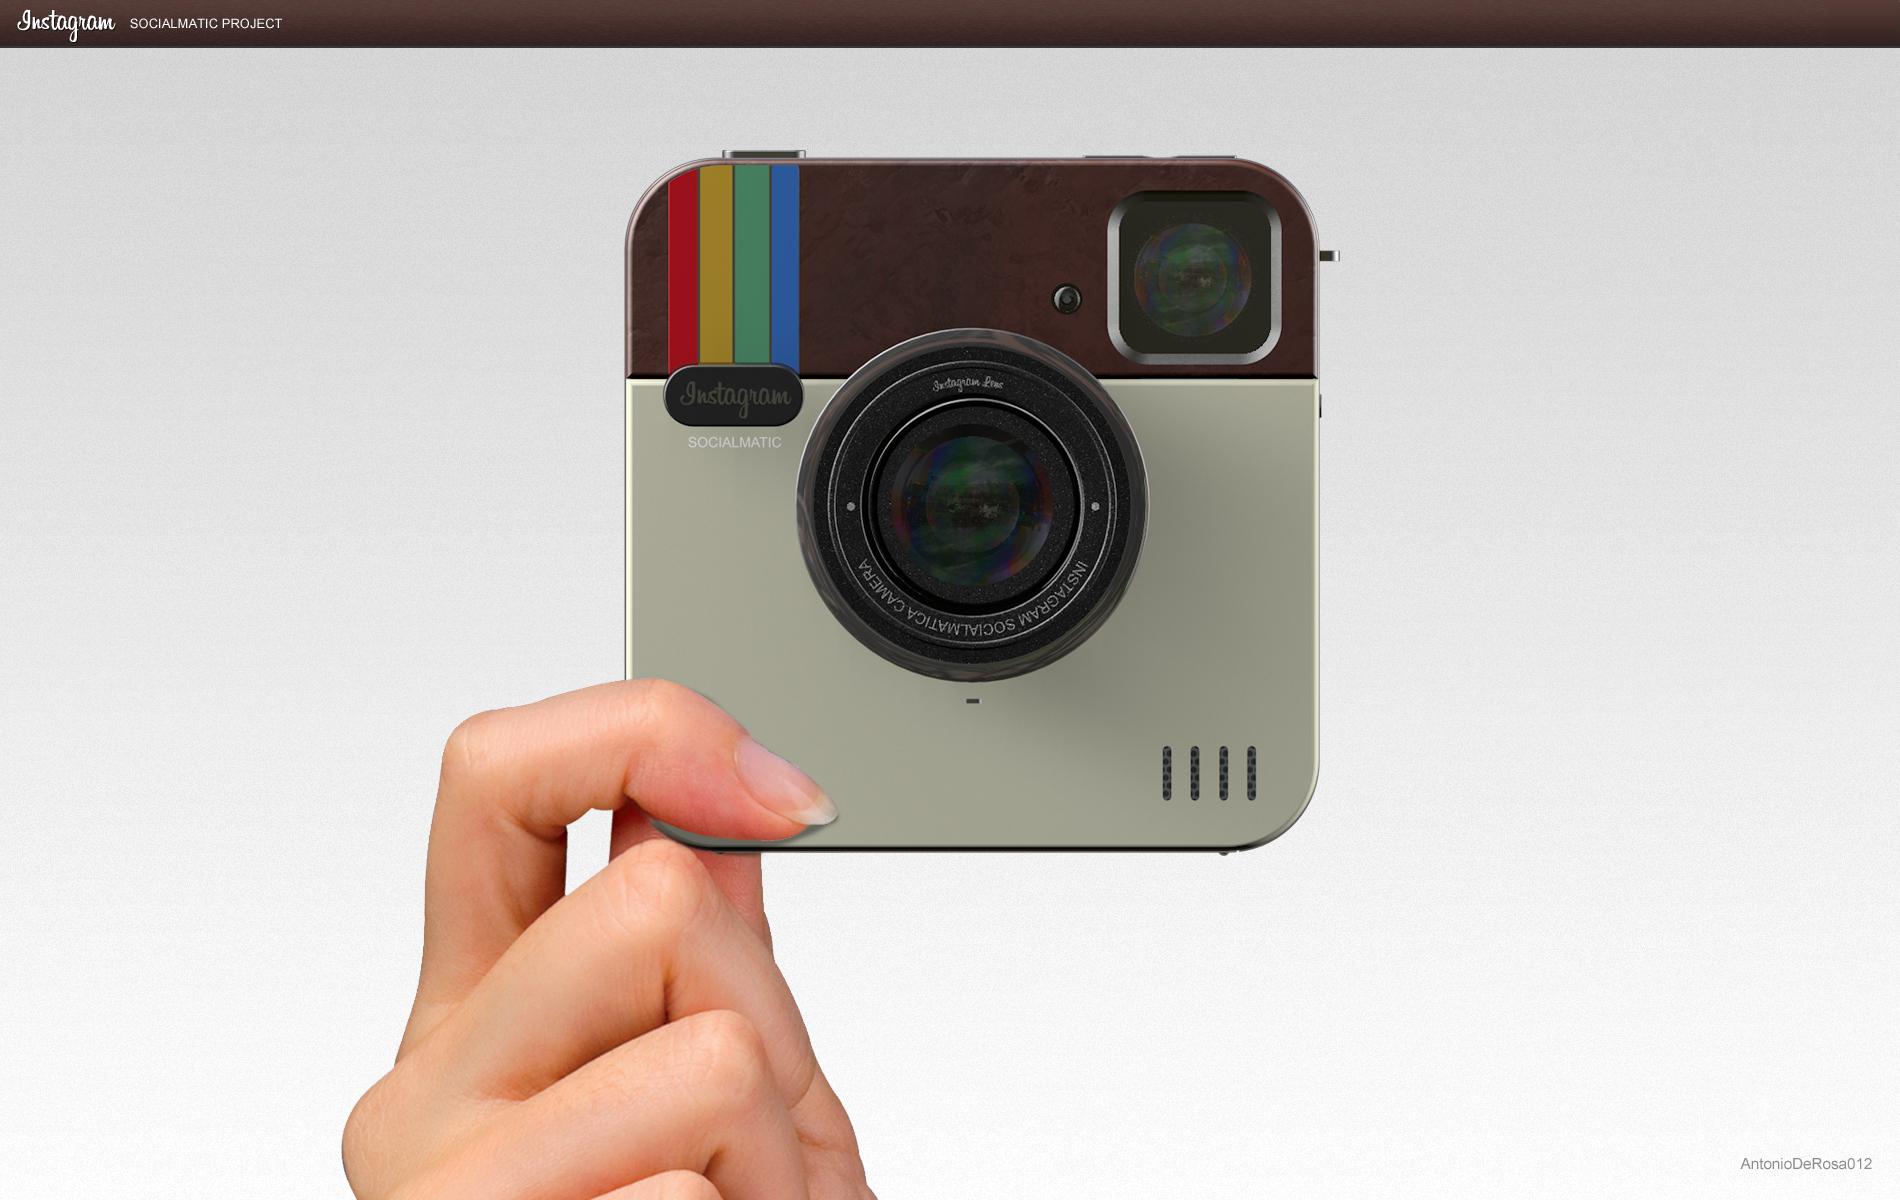 Ecco la fotocamera Instagram Socialmatic Camera, la digitale del noto socialnetwork | Concept [VIDEO]